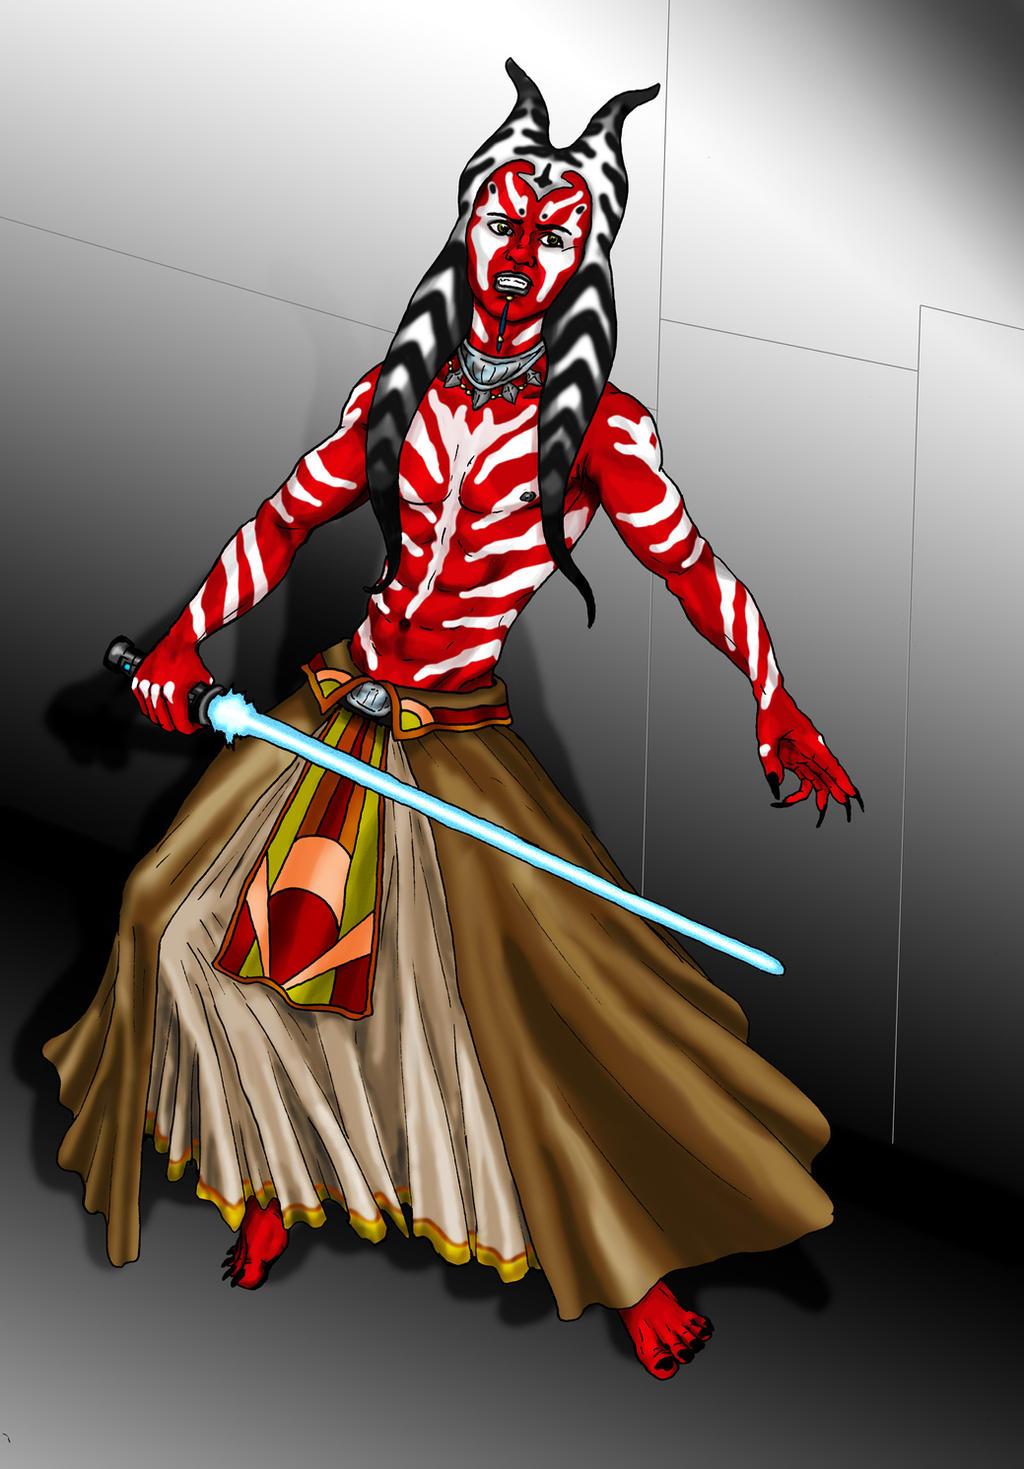 Image Result For Star Wars Ahsoka